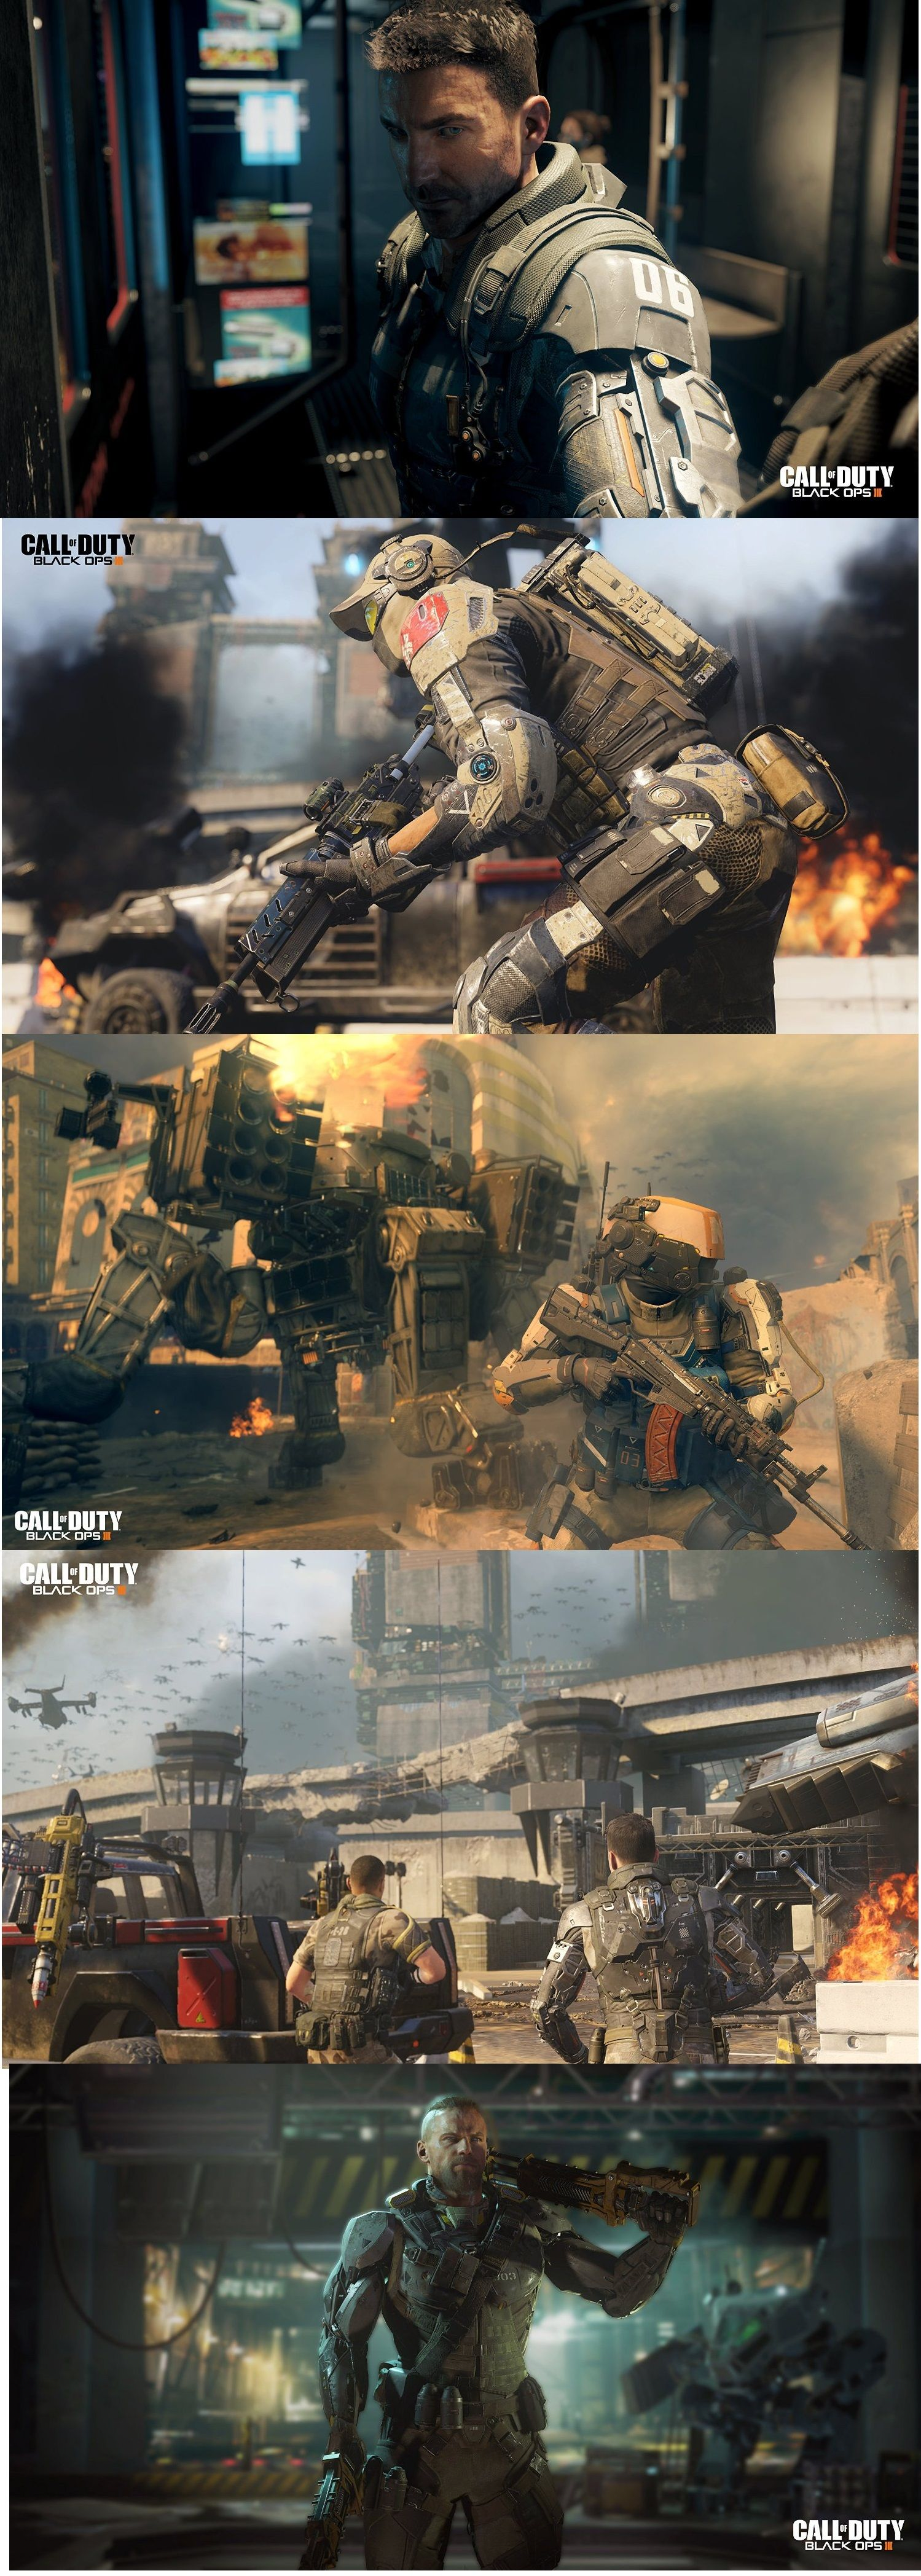 Pre Order Call of Duty Black Ops III Black ops, Call of